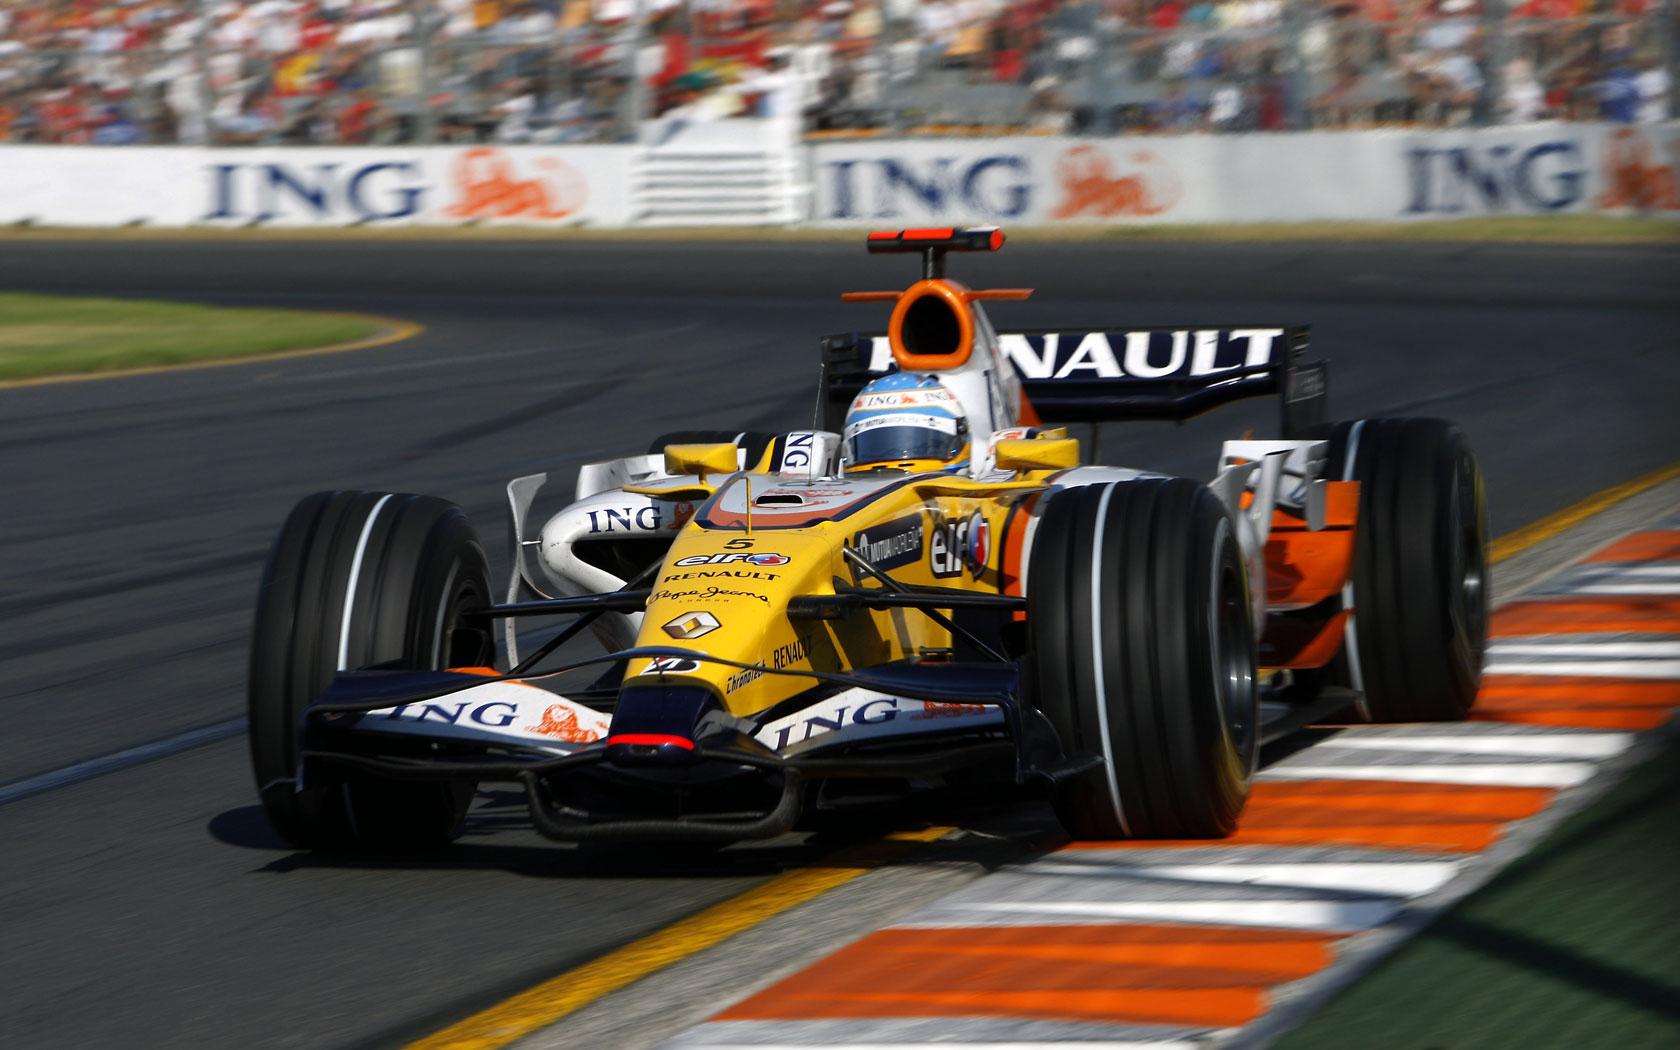 Hd Wallpapers 2008 Formula 1 Grand Prix Of Australia F1